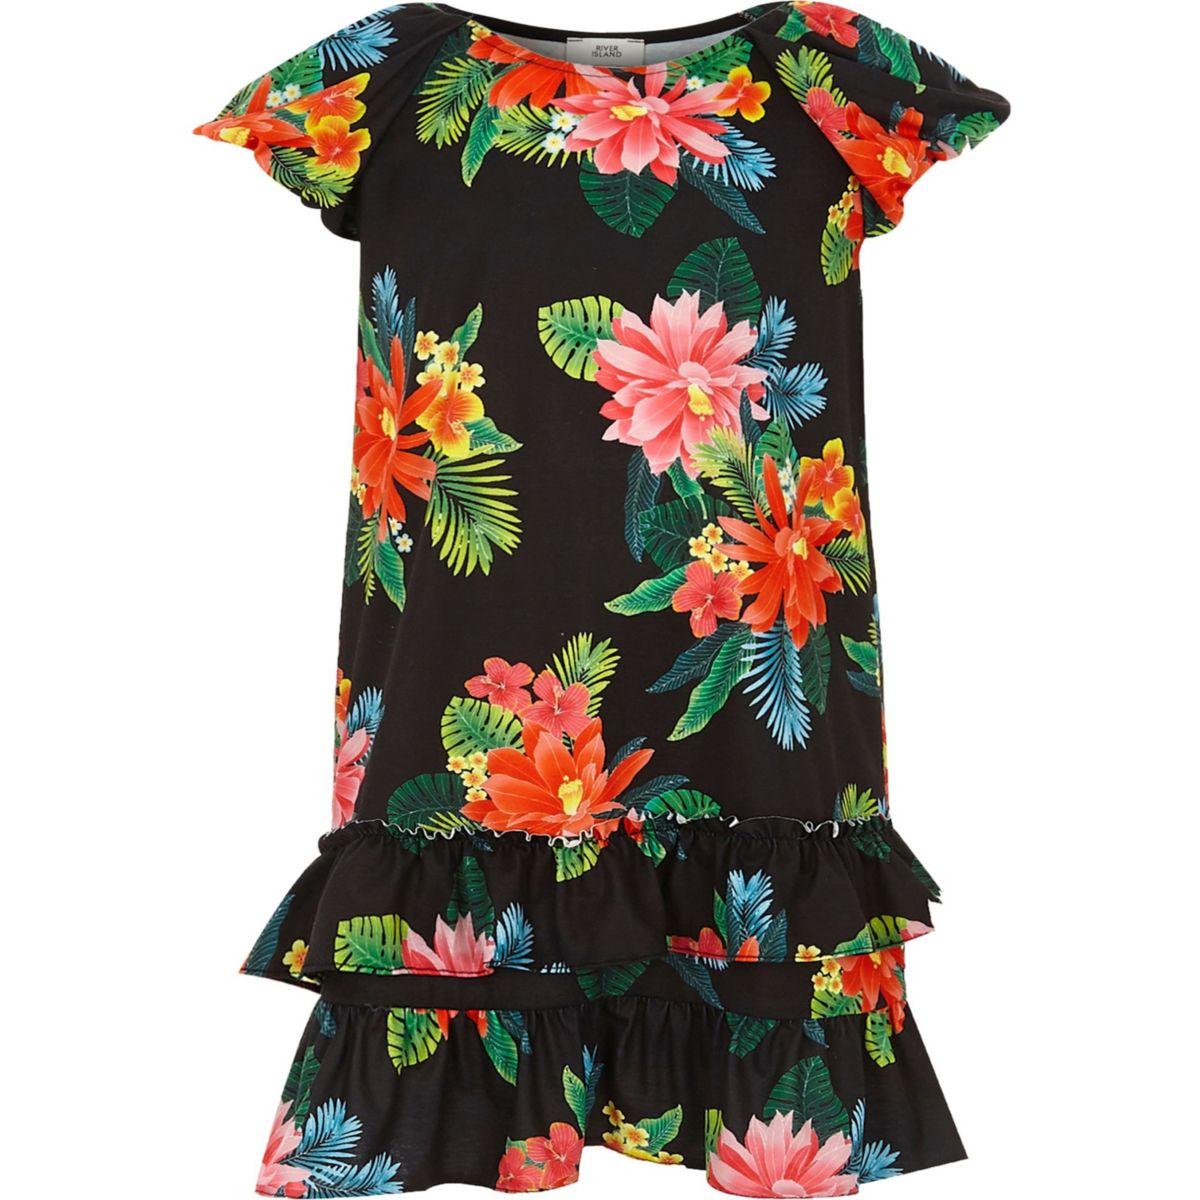 Girls black tropical frill puff sleeve dress